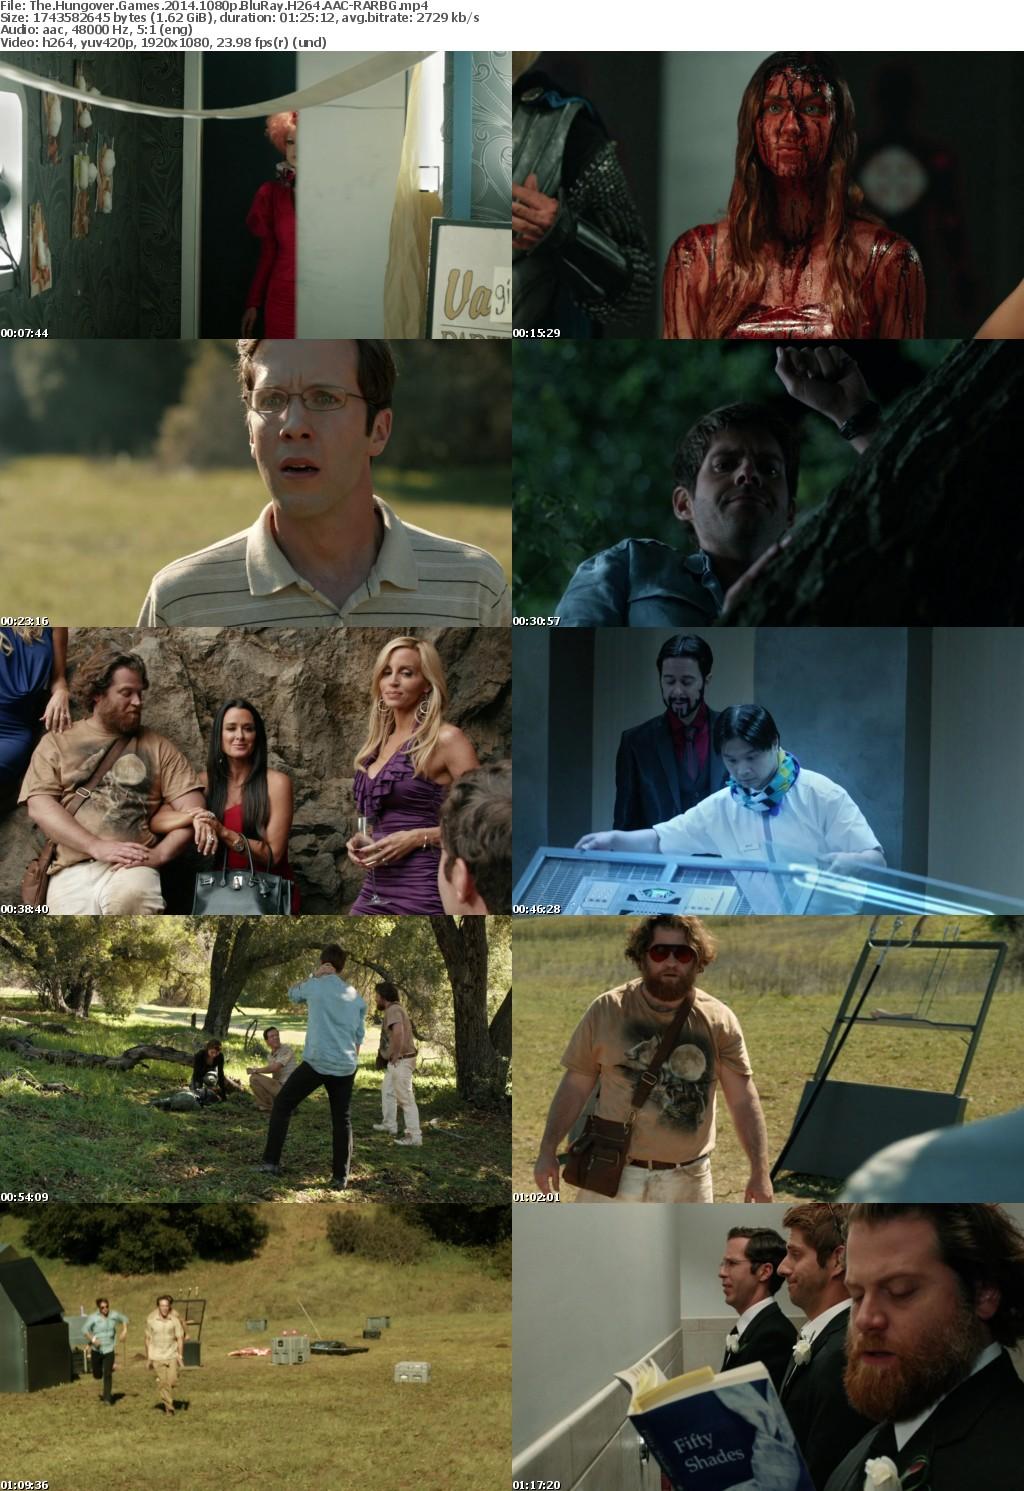 The Hungover Games (2014) 1080p BluRay H264 AAC-RARBG